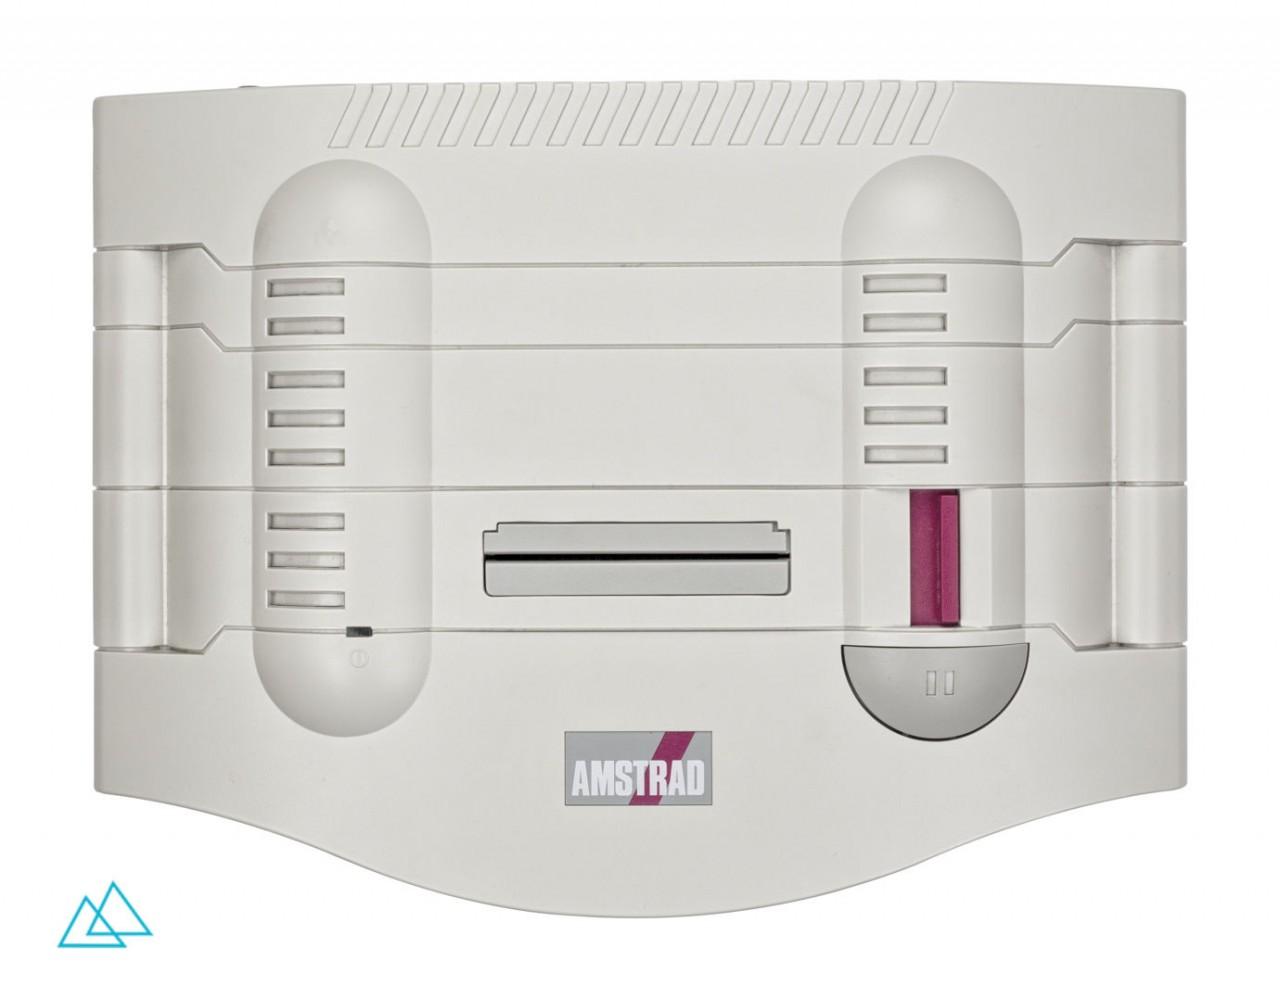 # 008 Amstrad GX4000